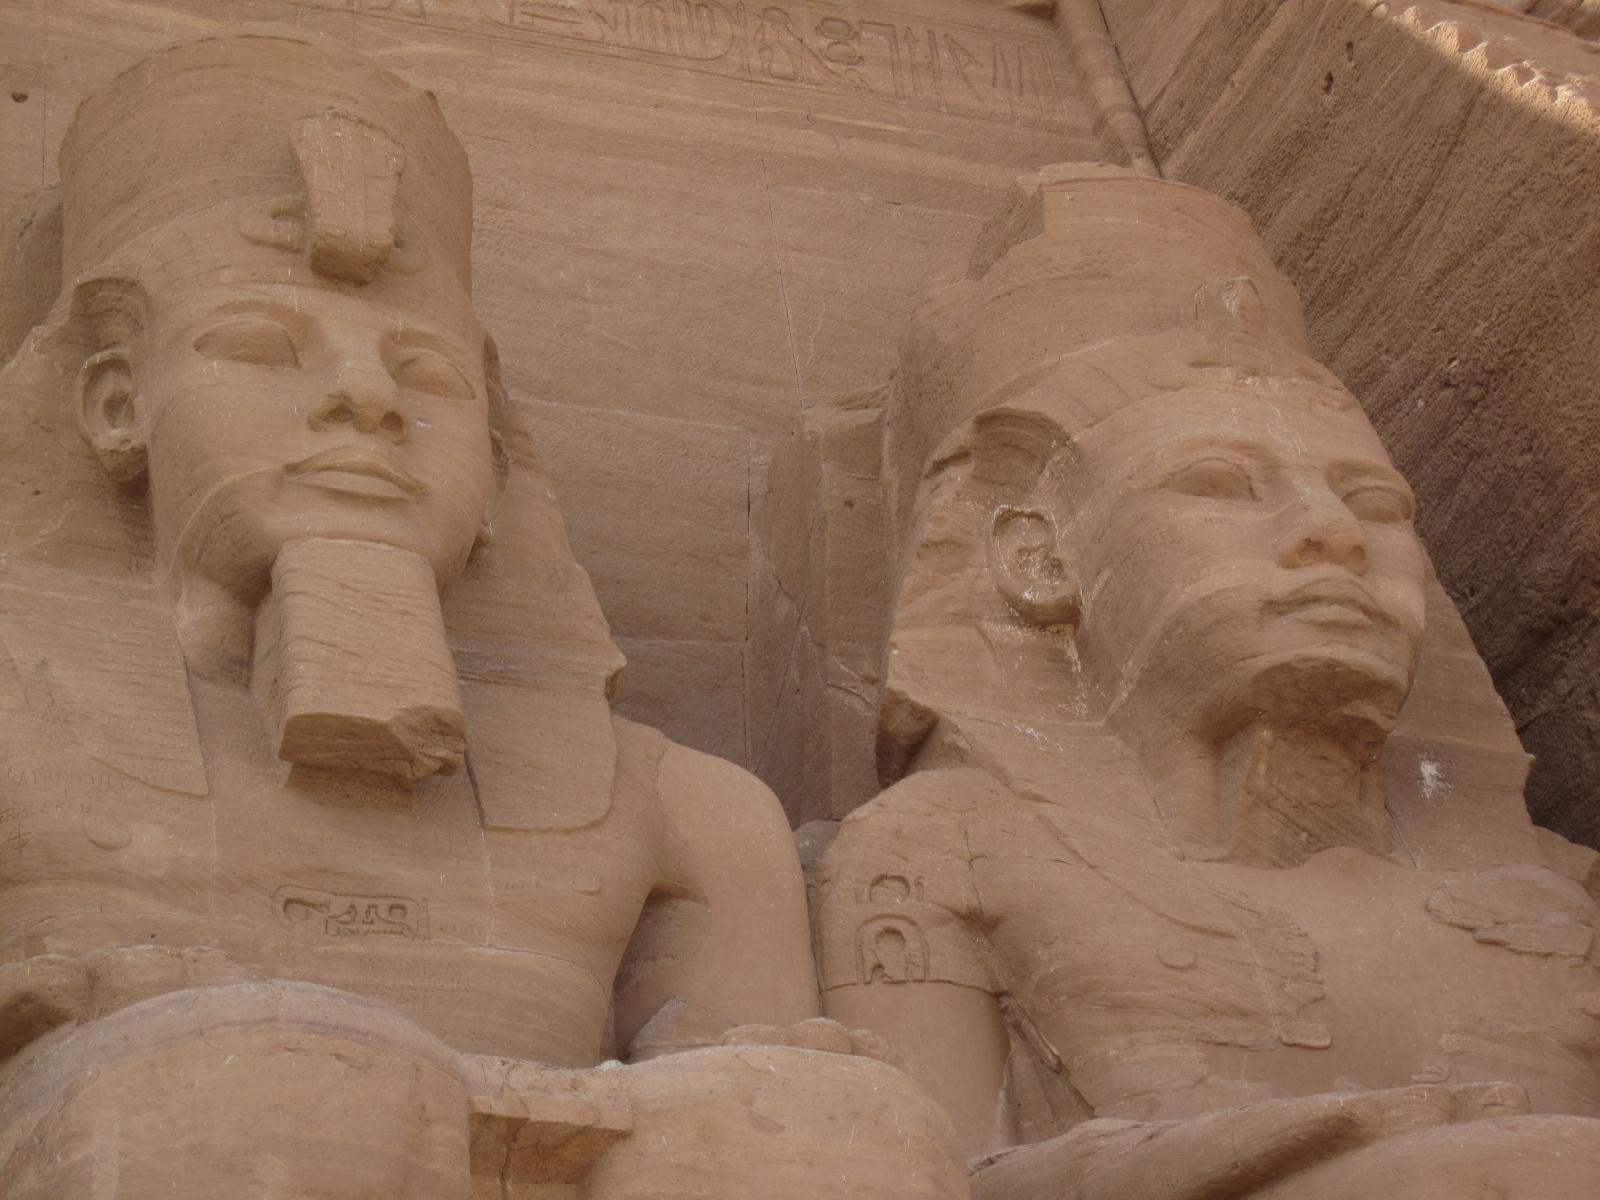 http://3.bp.blogspot.com/-PUgnJS_NvDs/TsURY70nT0I/AAAAAAAAFQo/ciImiGAmzsA/s1600/egypt+pyramids+sphinx+hd+wallpapers.JPG